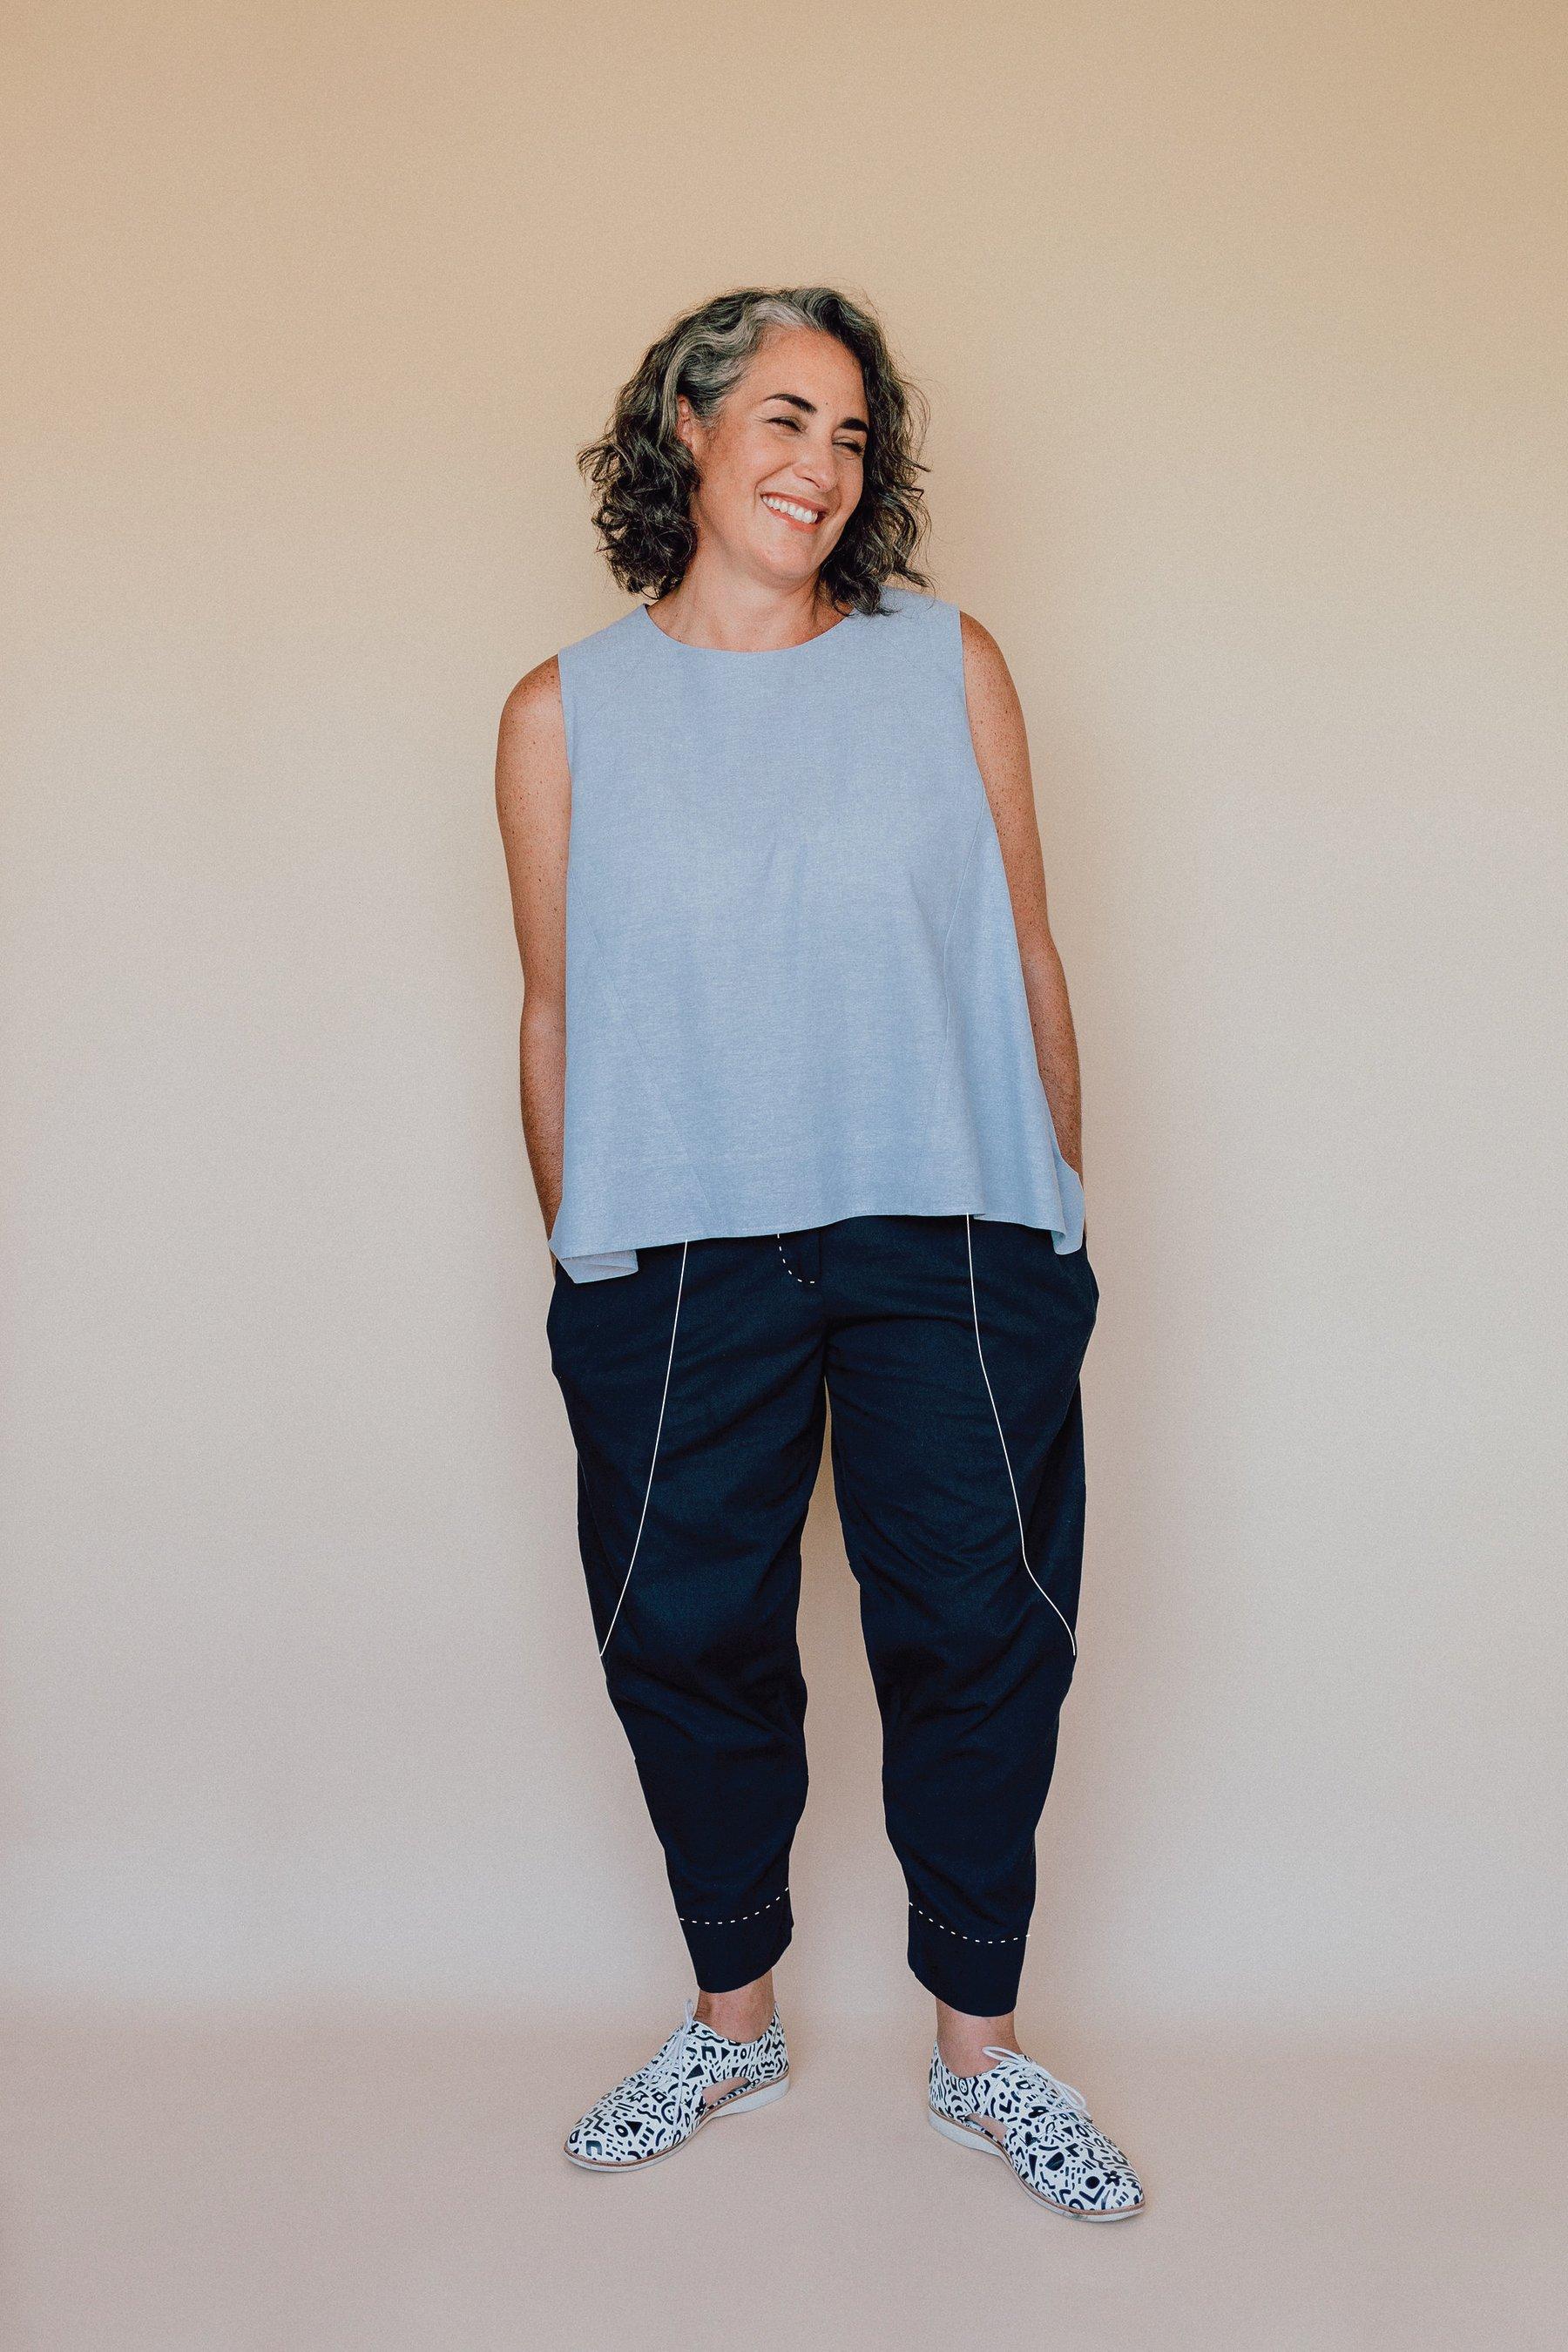 Darlow pants sew-along -